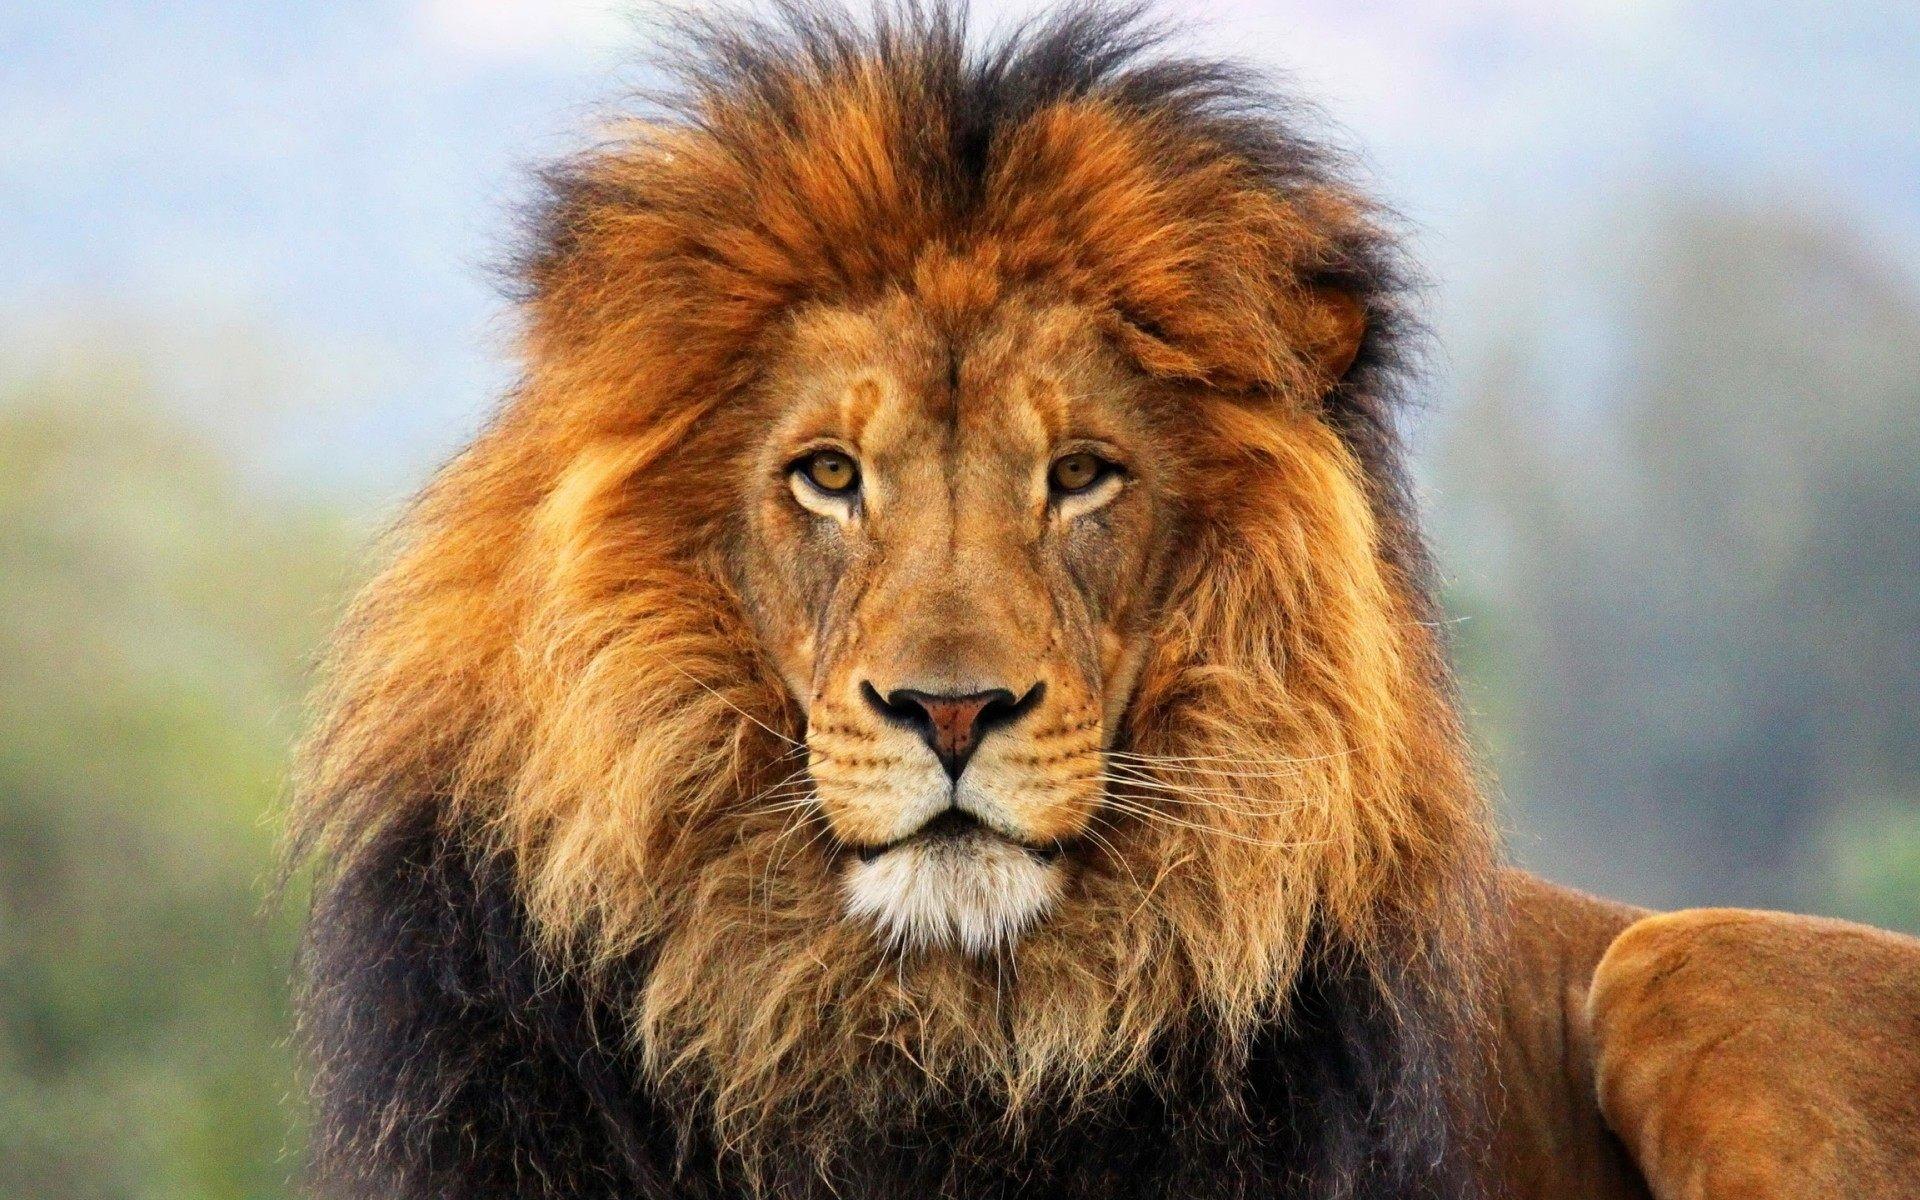 Lion Head Wallpaper